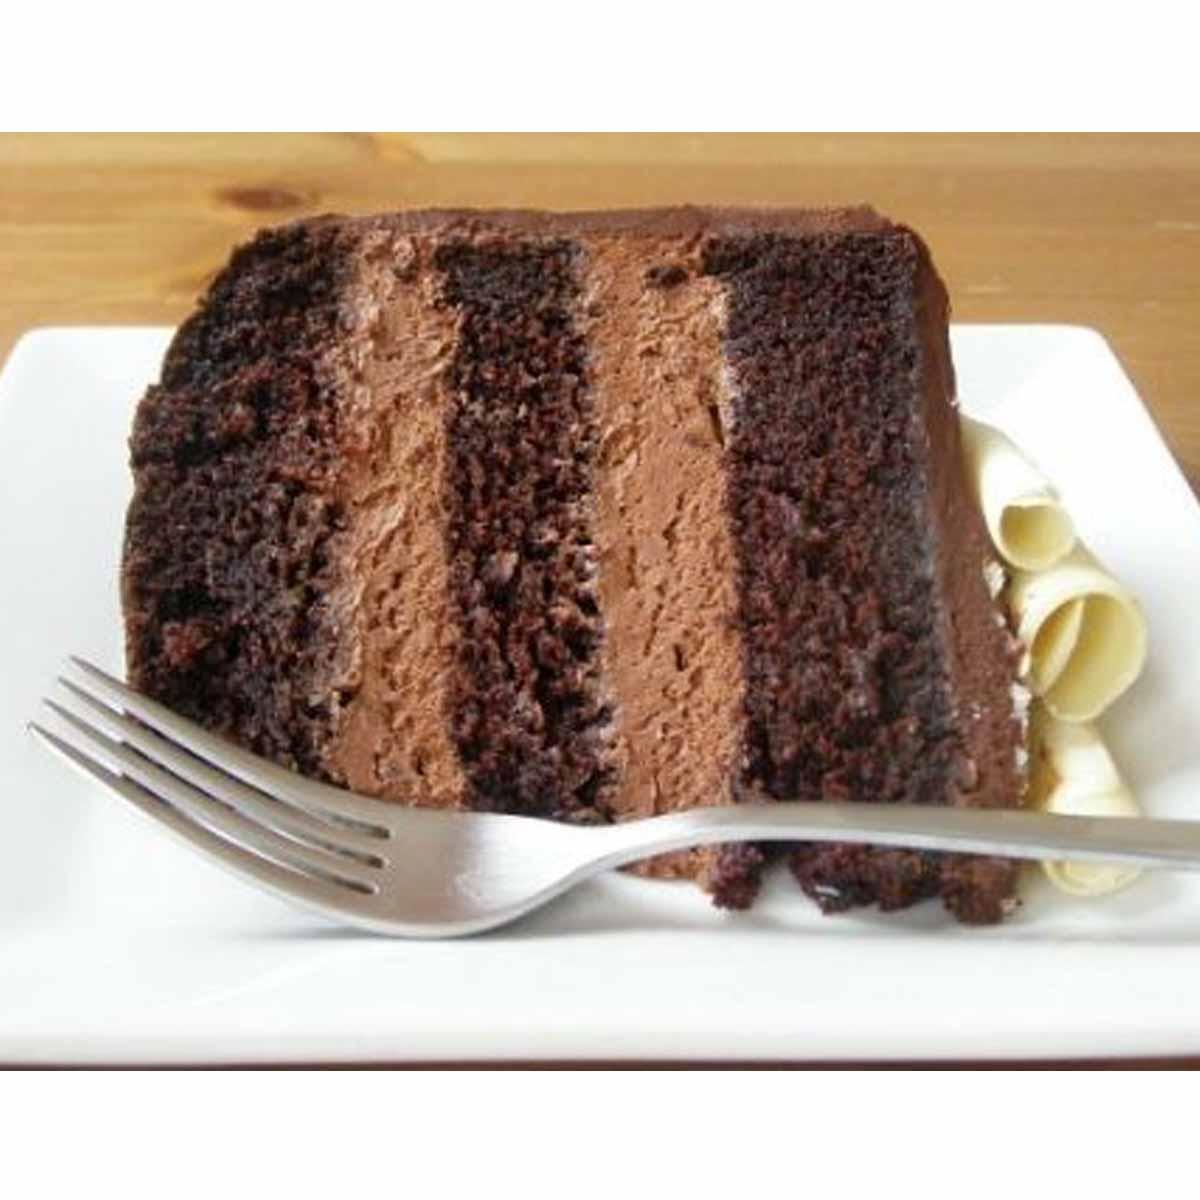 Chocolate Meio Amargo Kibbles picado 10kg Sicao Gold